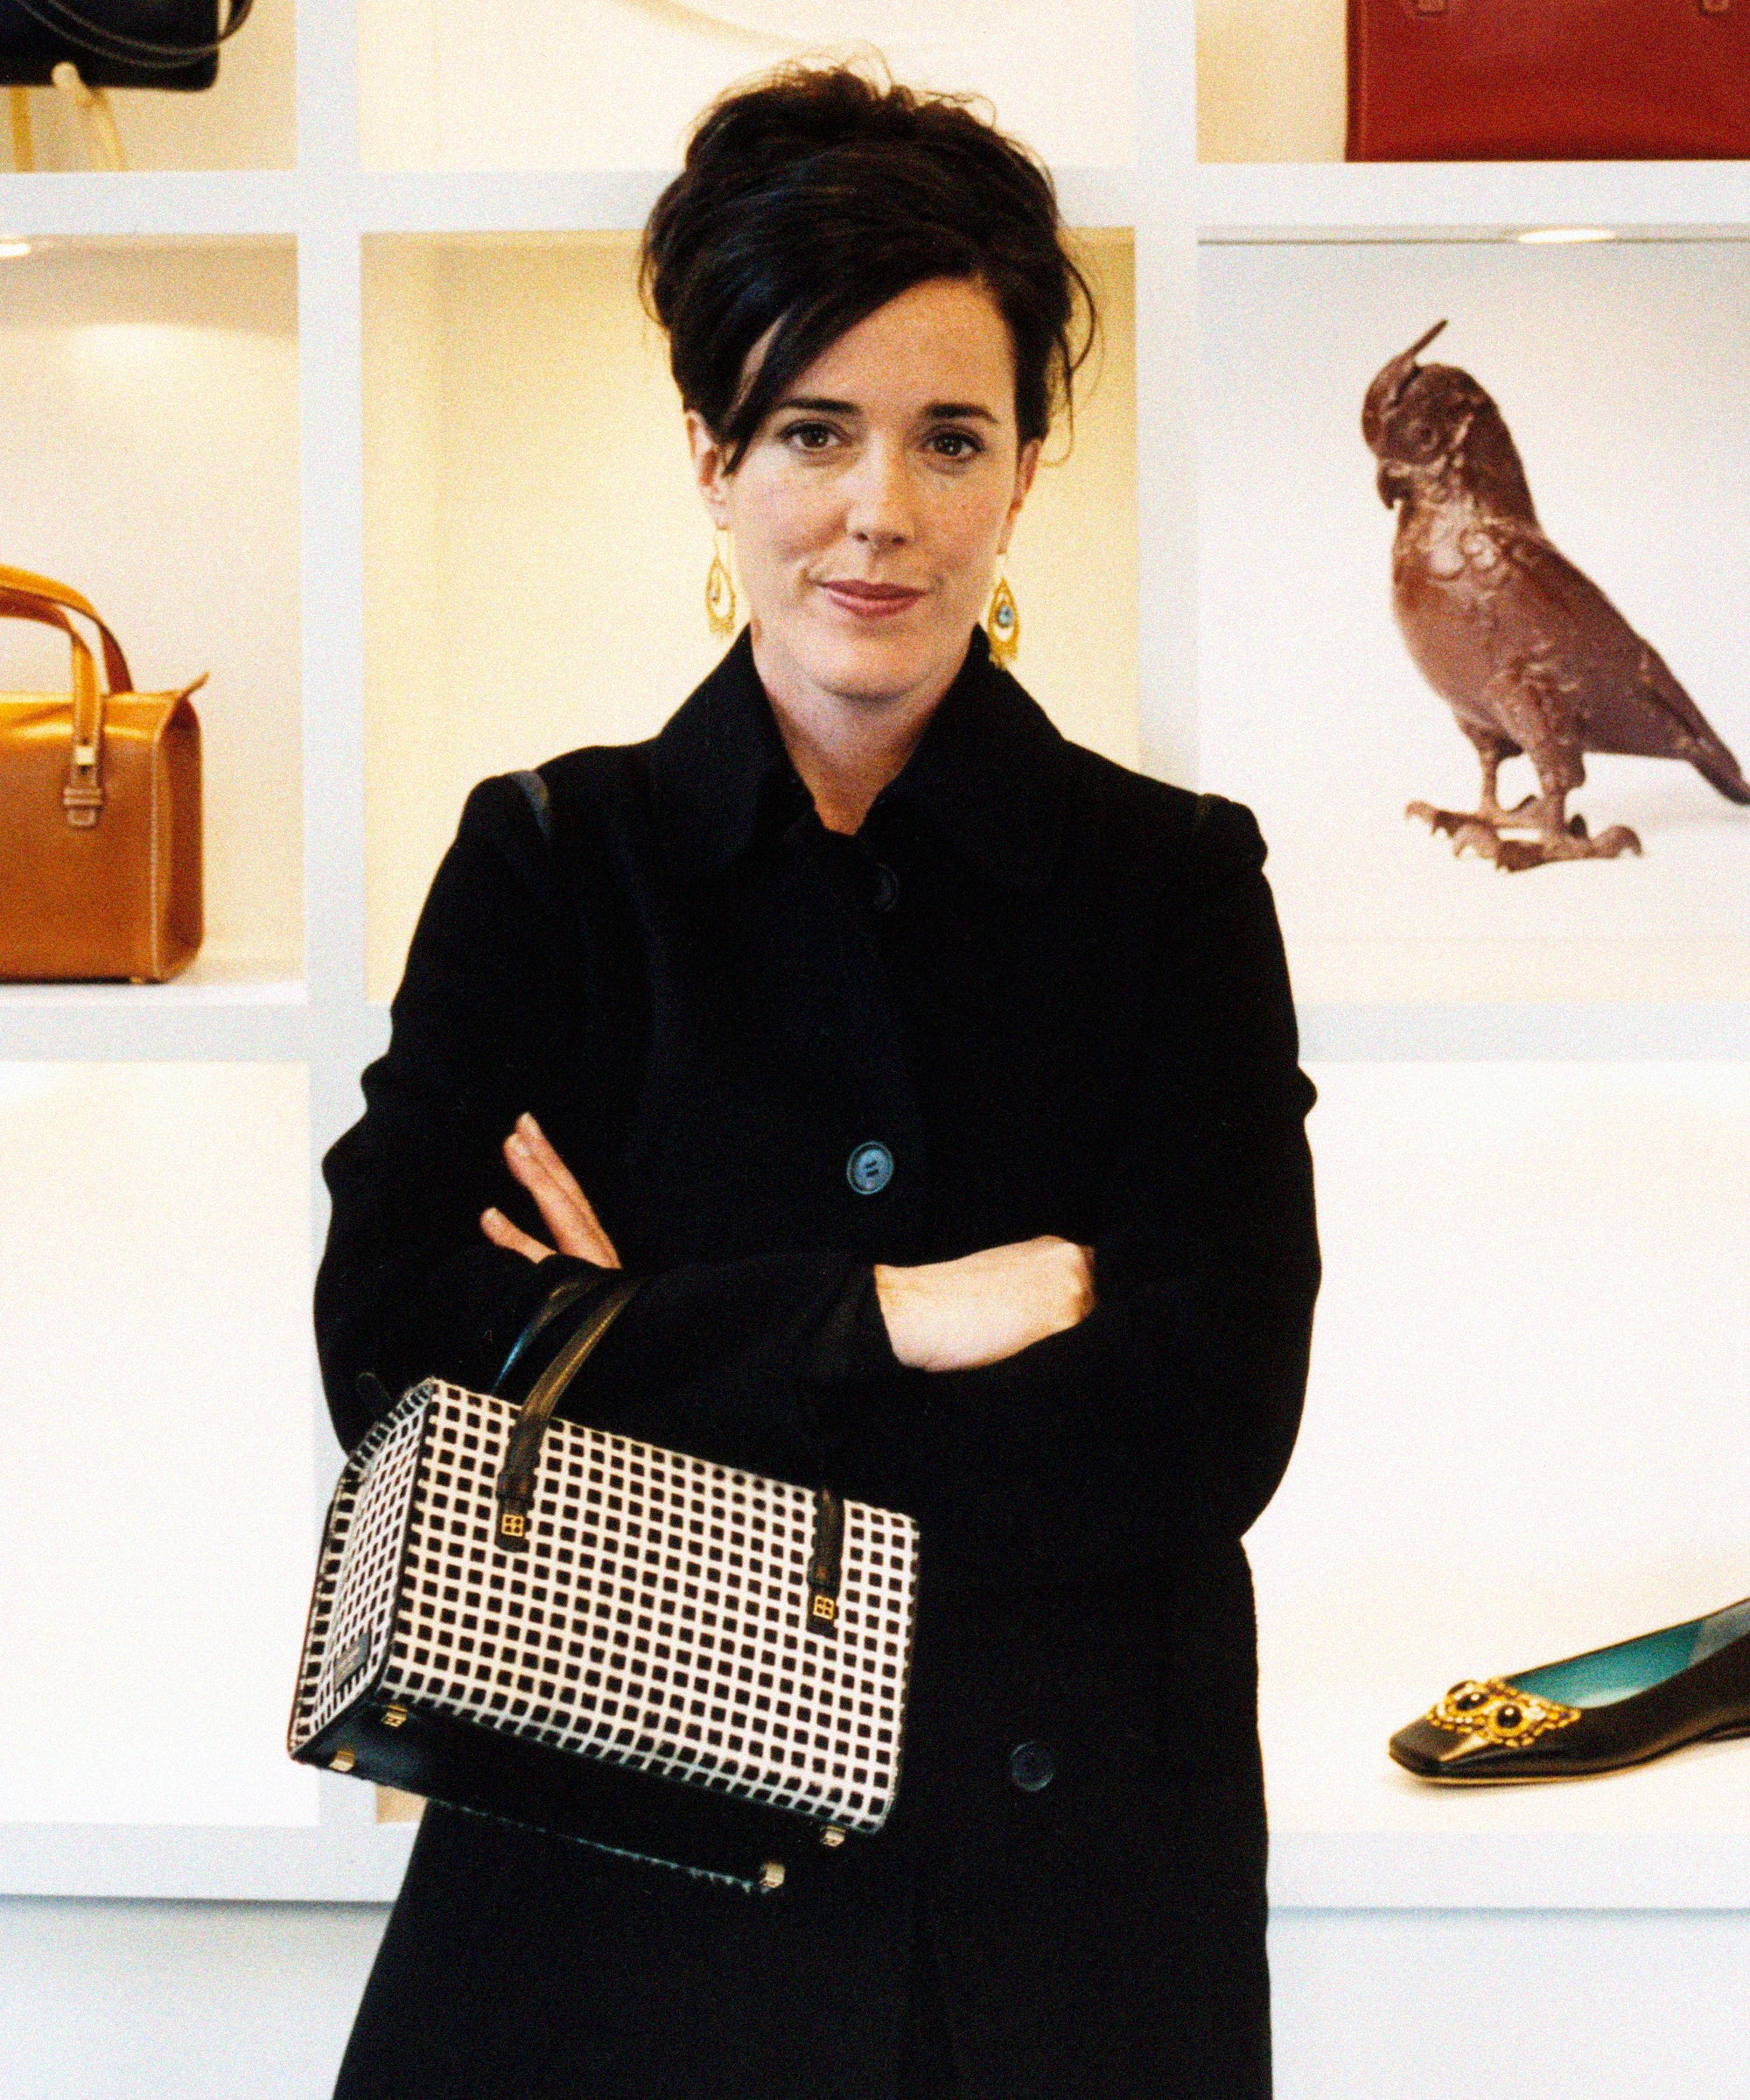 Kate Spade Found Dead Designer Leaves Behind Daughter